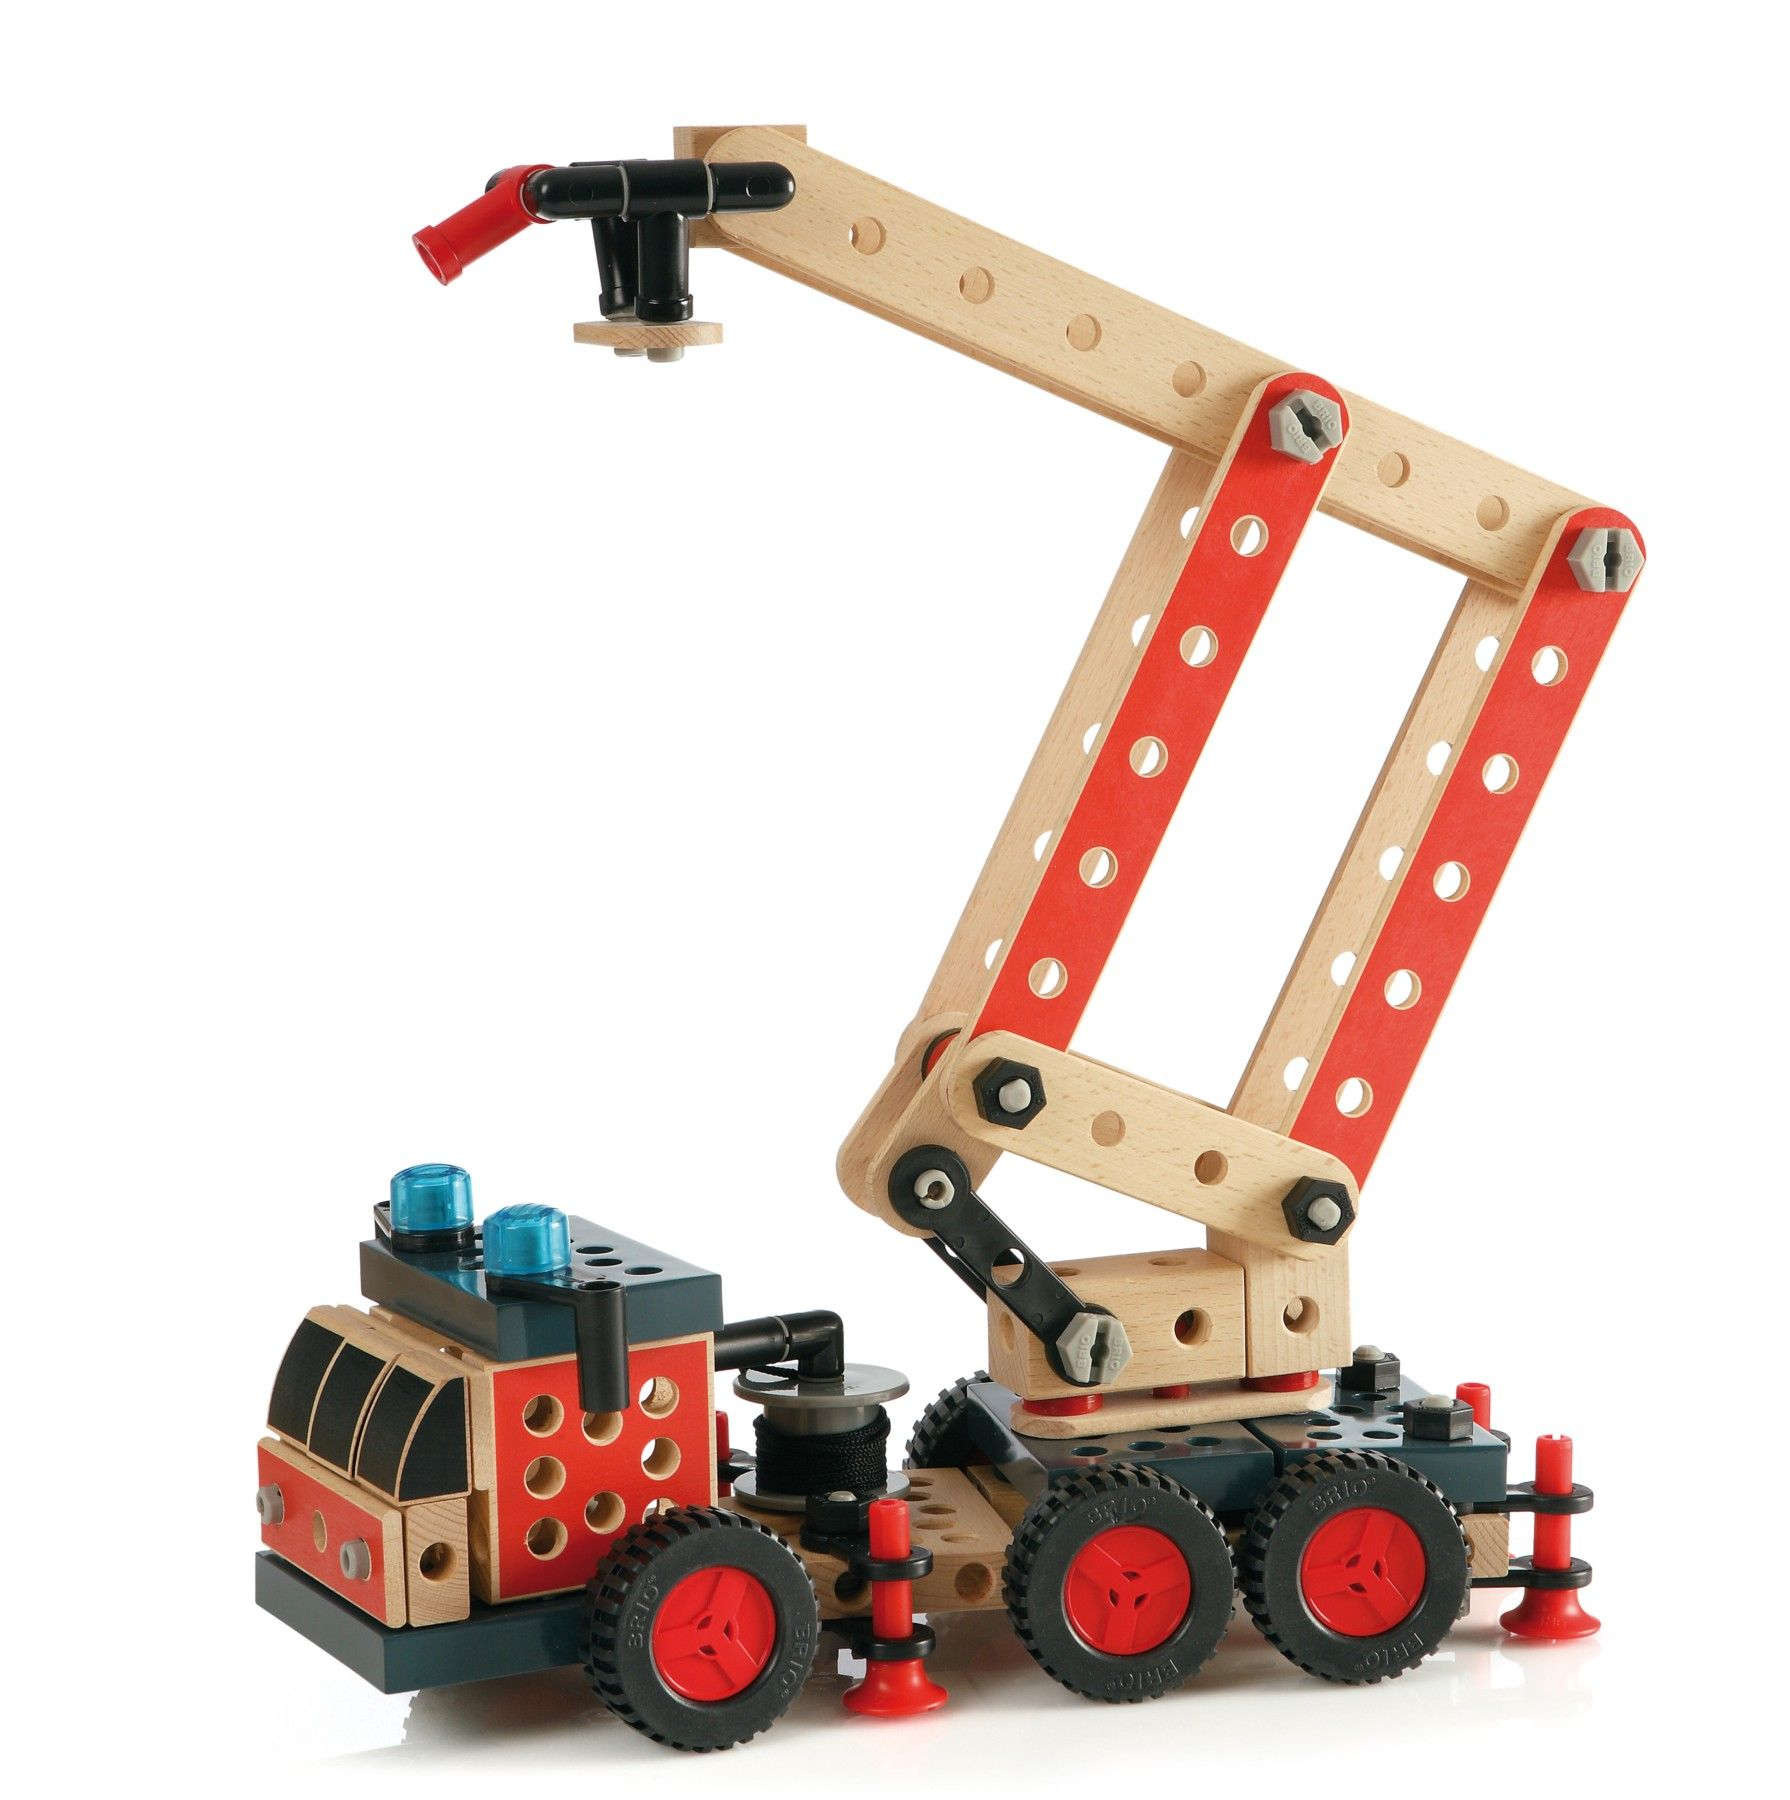 Sensational Brio Builder System Fire Truck Builder Oyuncak Brio Theyellowbook Wood Chair Design Ideas Theyellowbookinfo